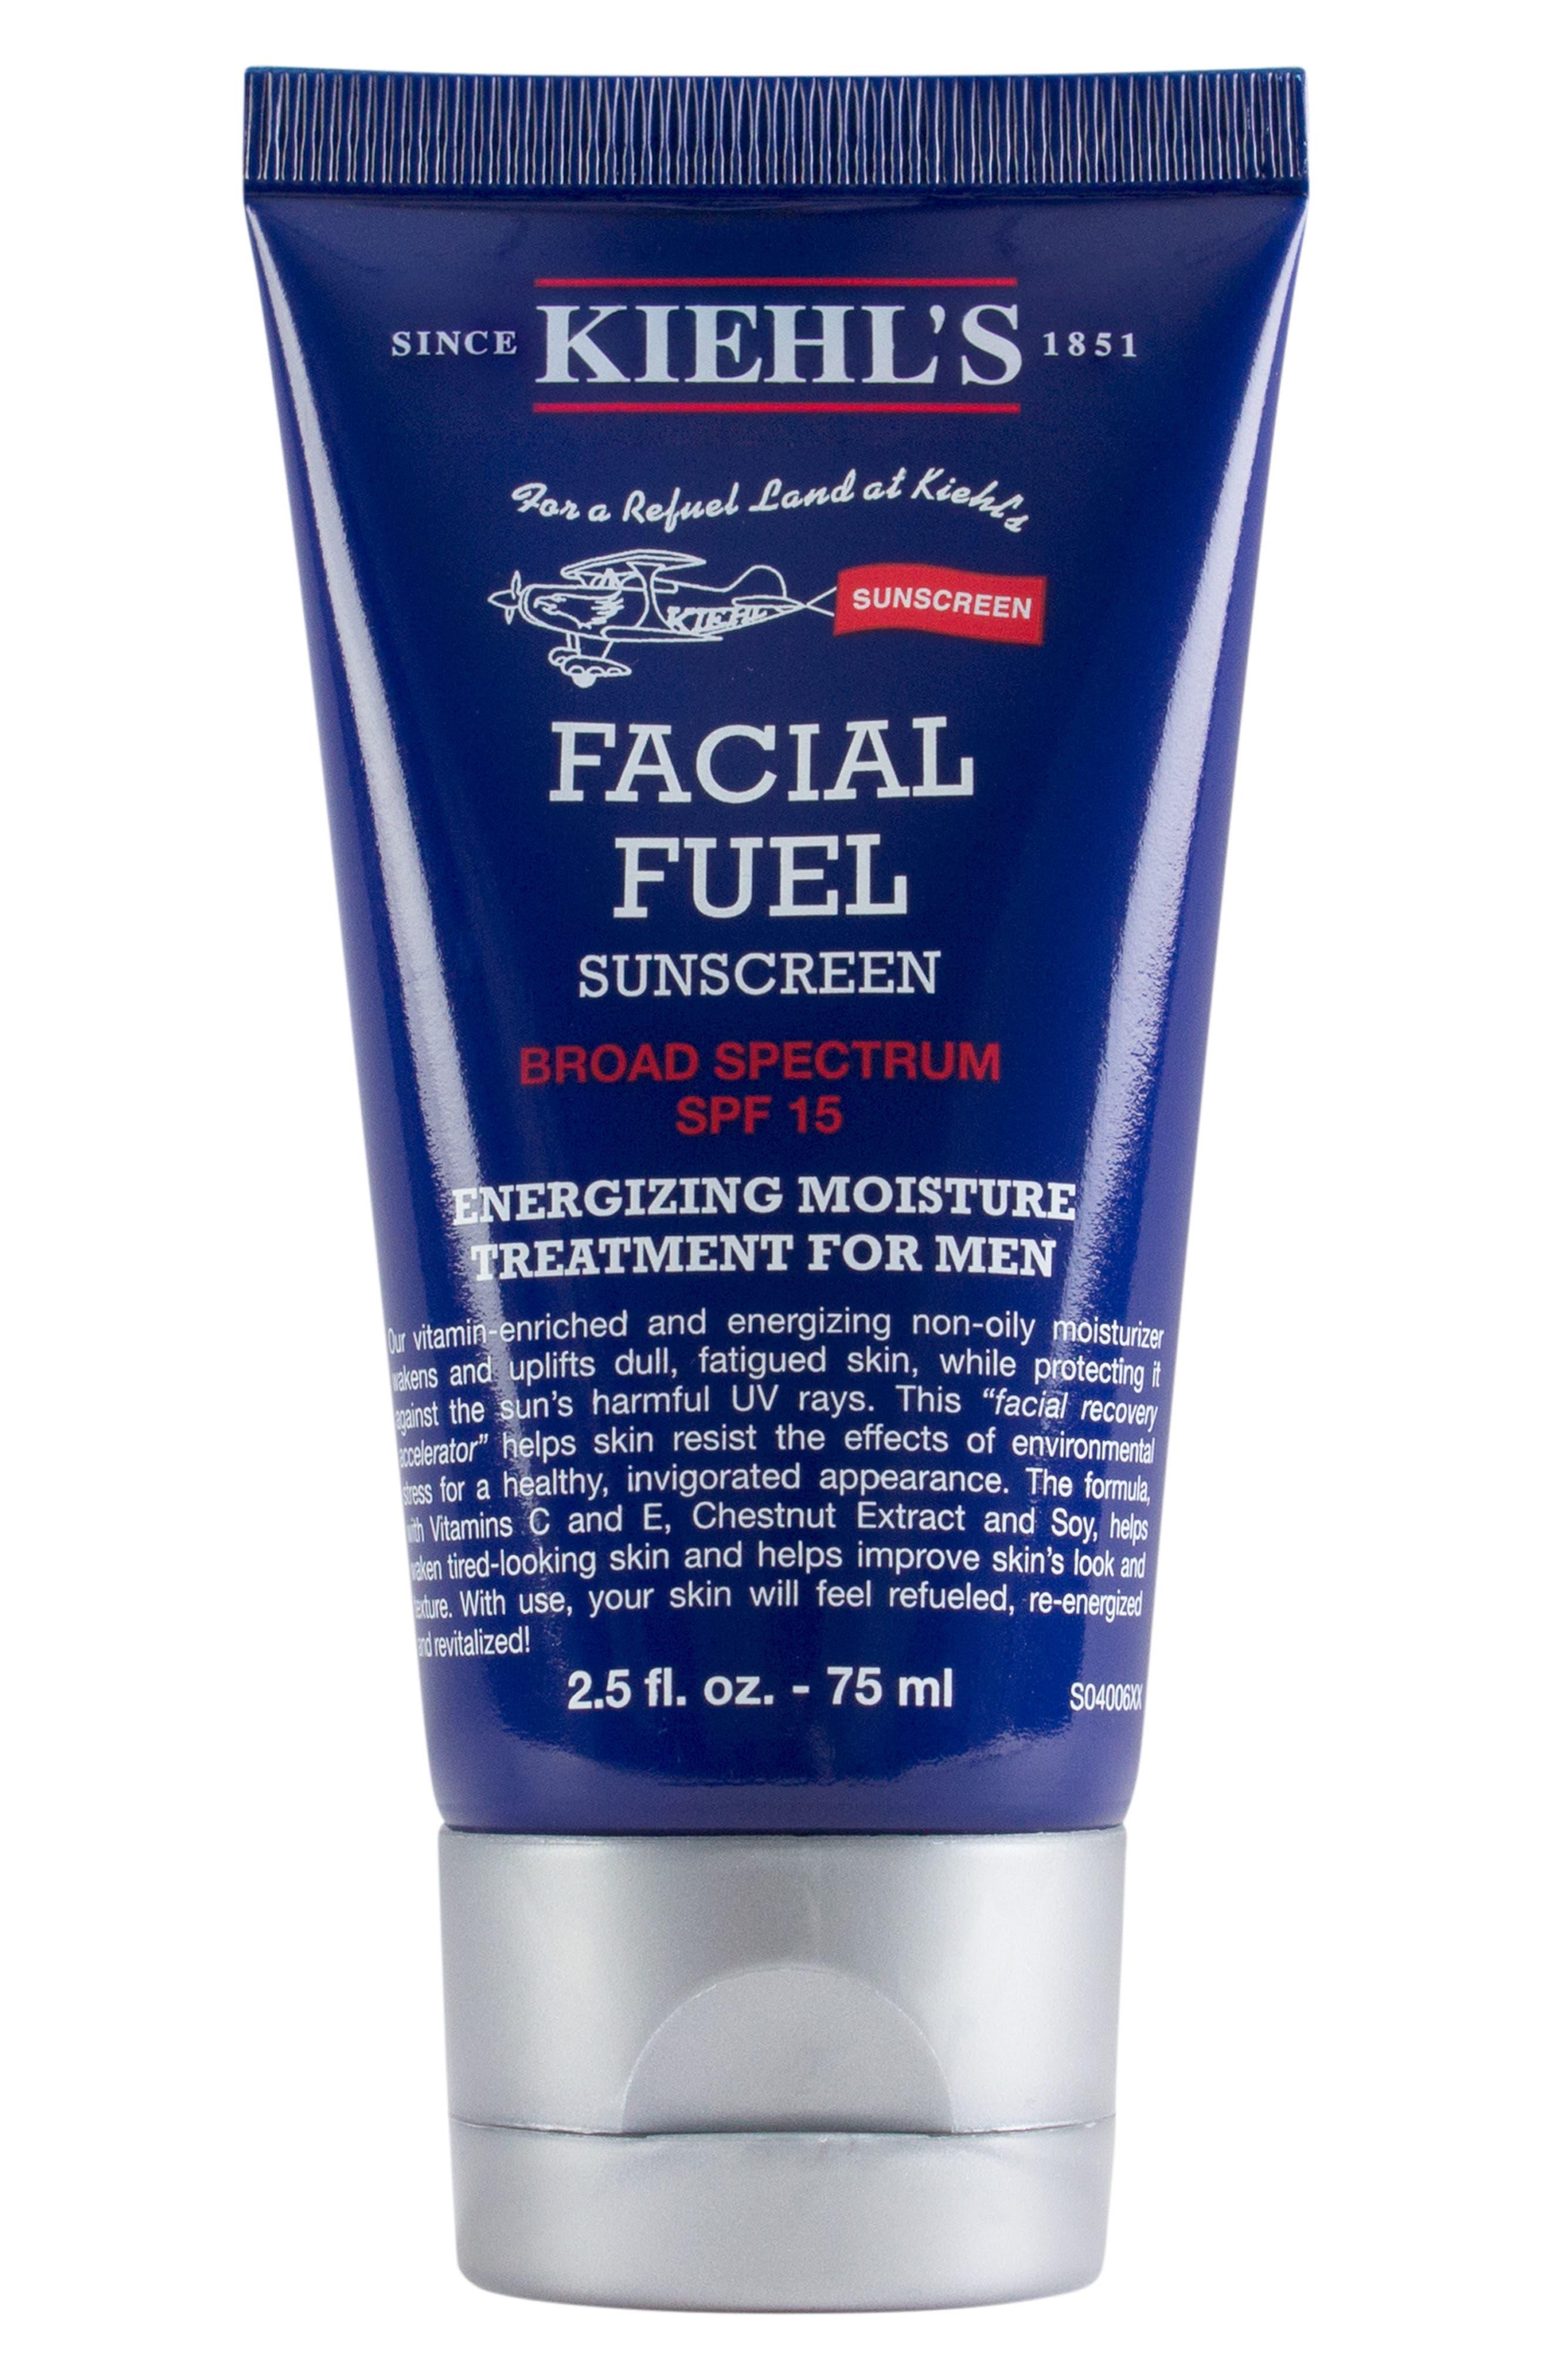 Facial Fuel Energizing Moisture Treatment for Men SPF 15,                             Alternate thumbnail 2, color,                             NONE